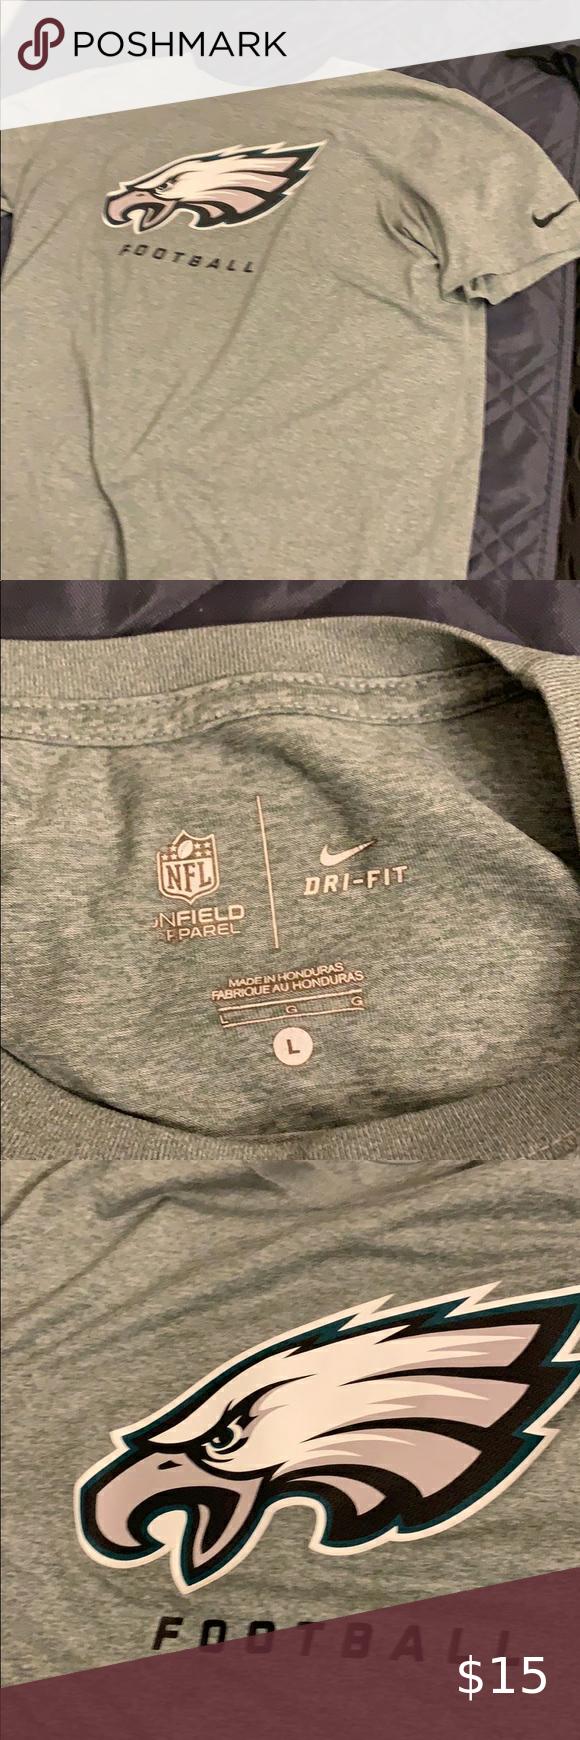 Philadelphia Eagles Nike Retro Hoodie Sweatshirt Nike Retro Sweatshirts Sweatshirts Hoodie [ 1740 x 580 Pixel ]